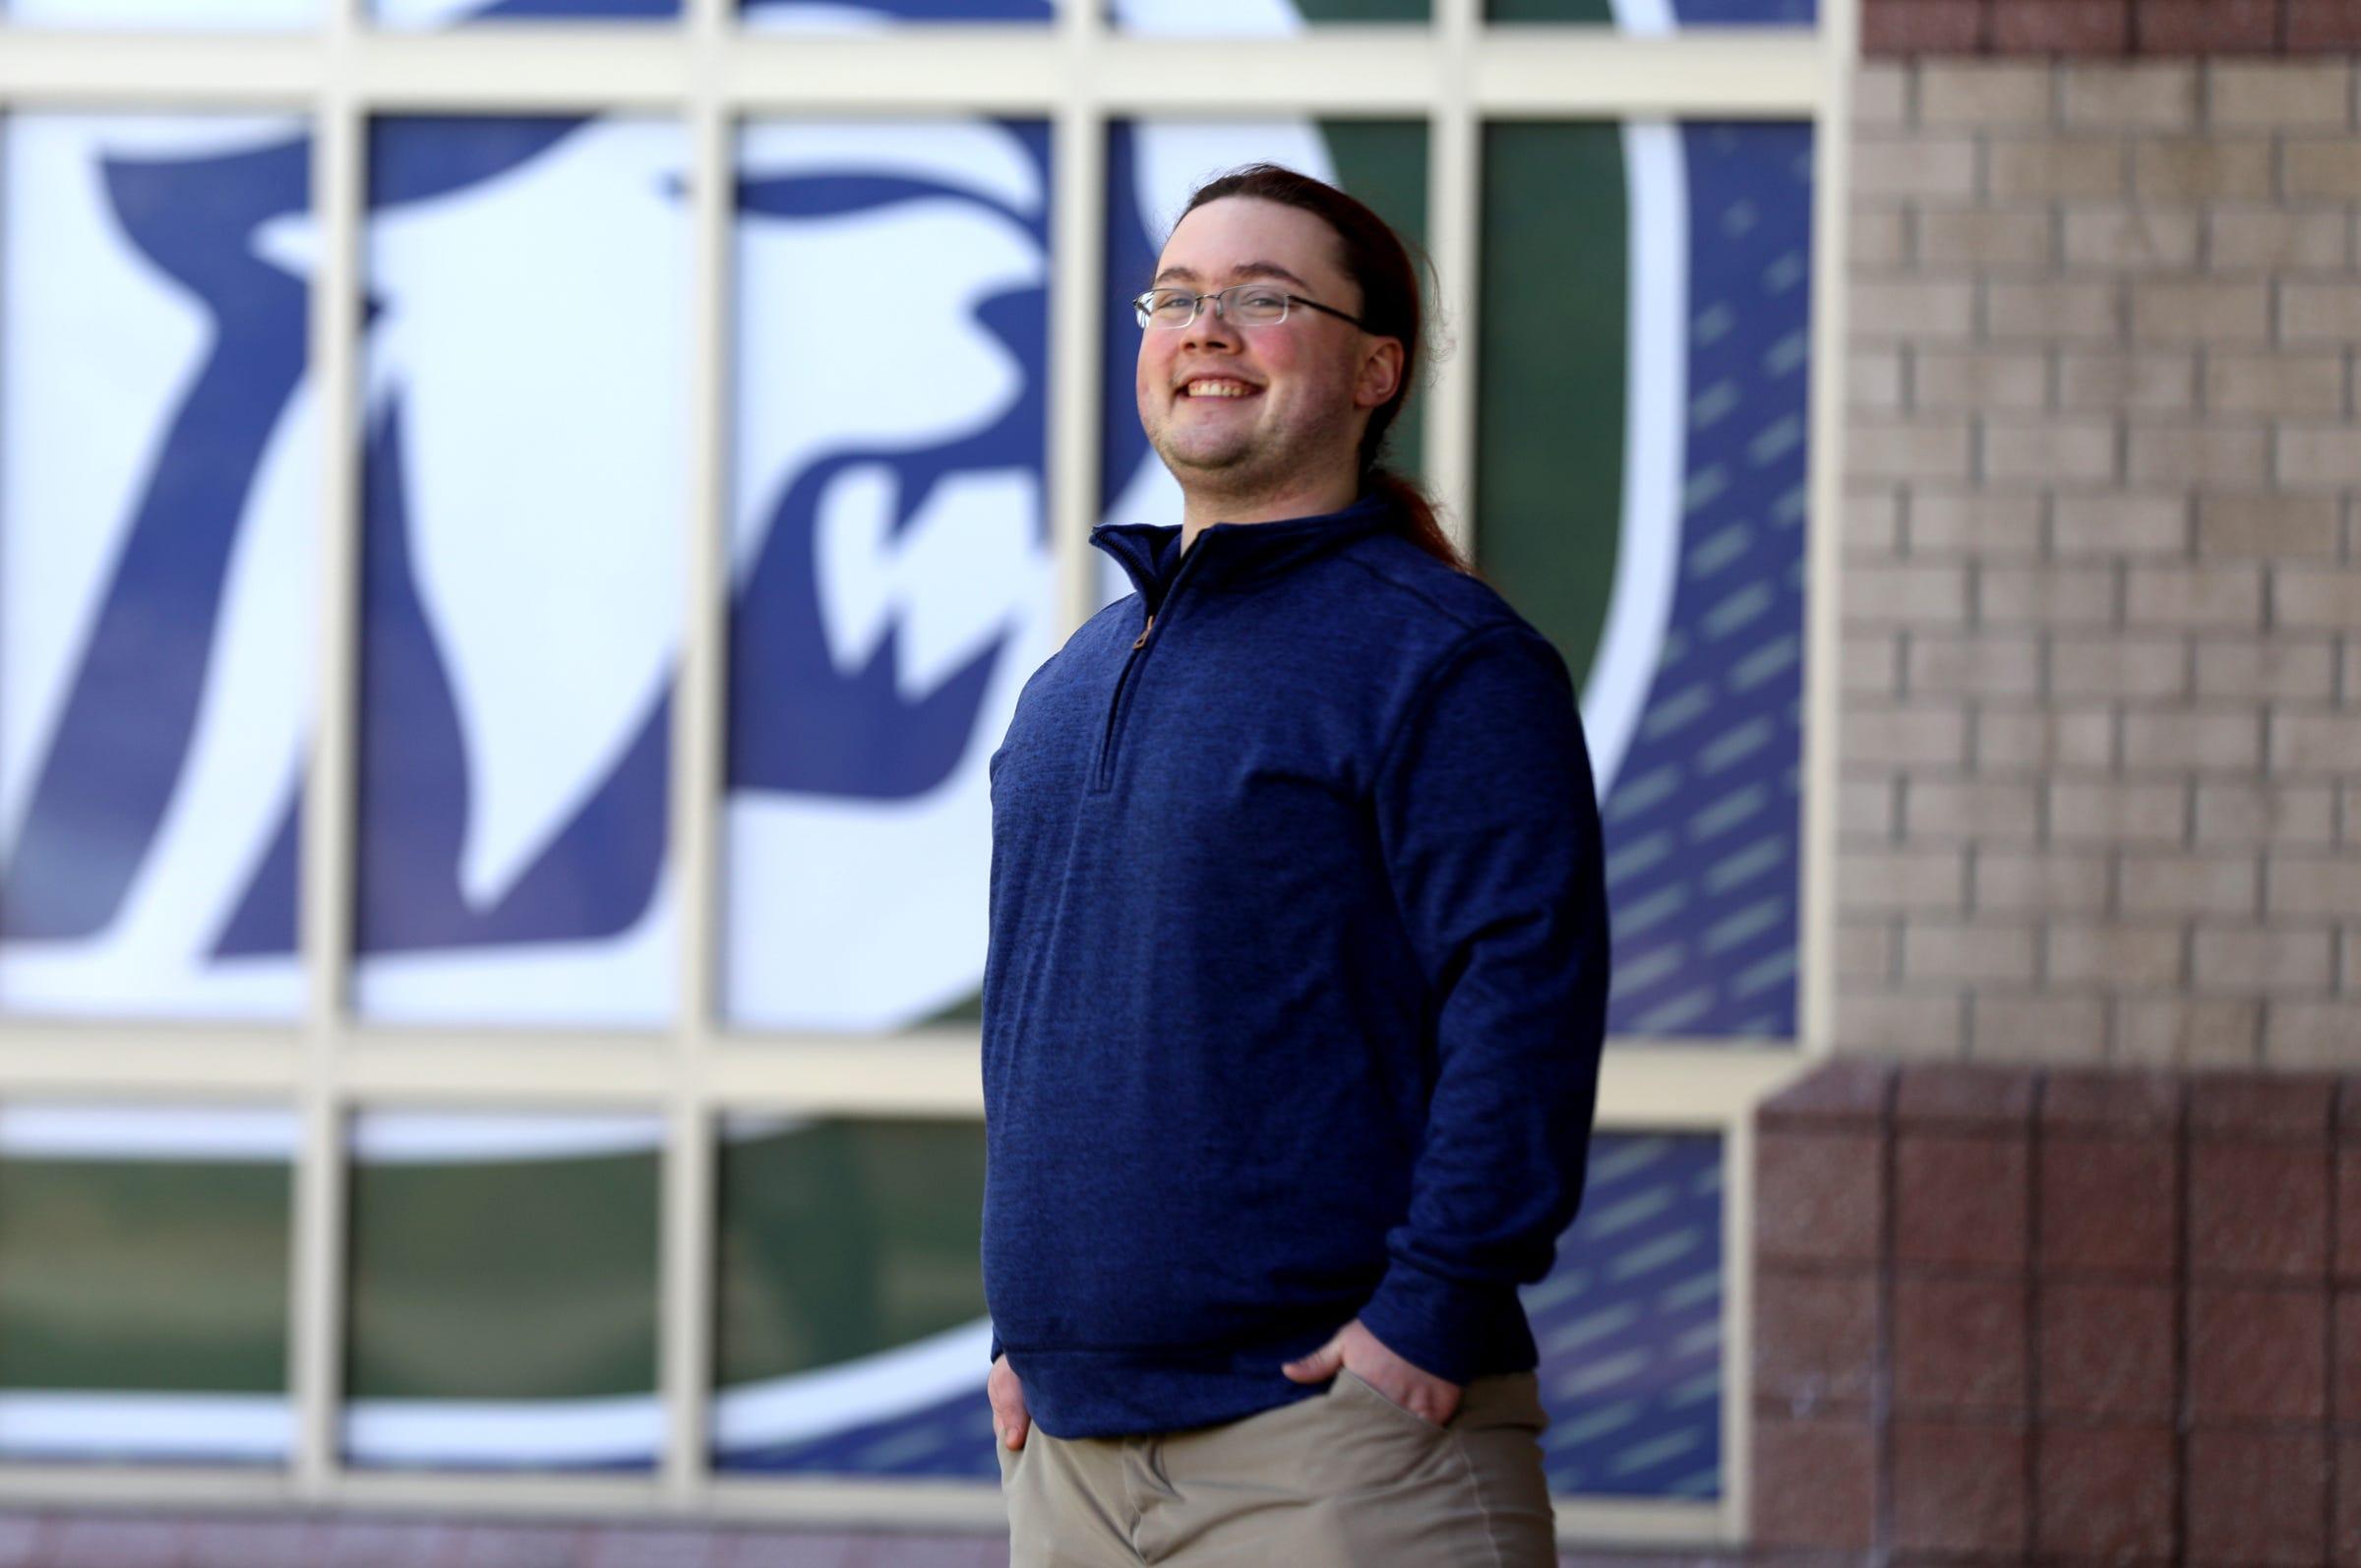 Parker McFarlen, a senior at Dakota High School in Macomb, Michigan.